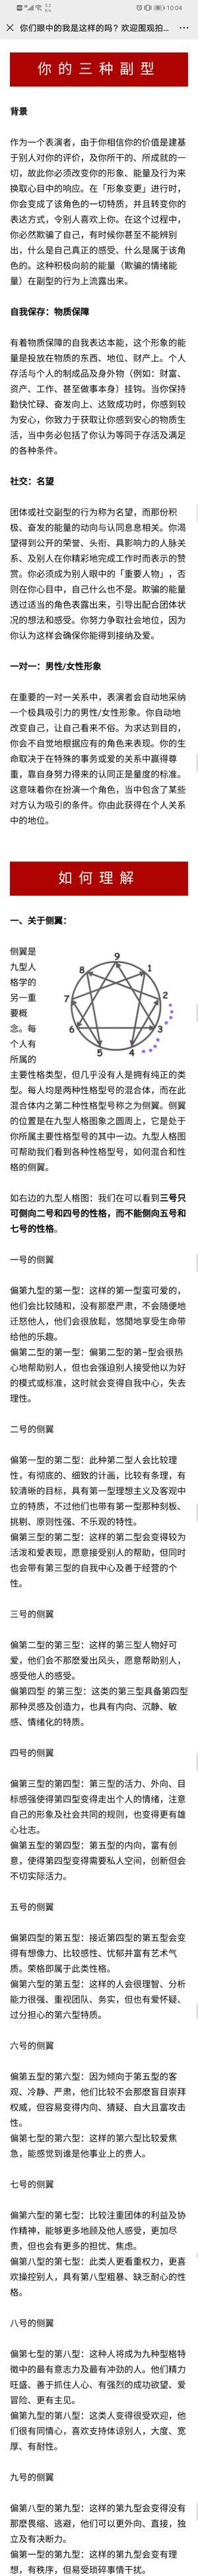 Screenshot_20200115_100416_com.tencent.mm.jpg